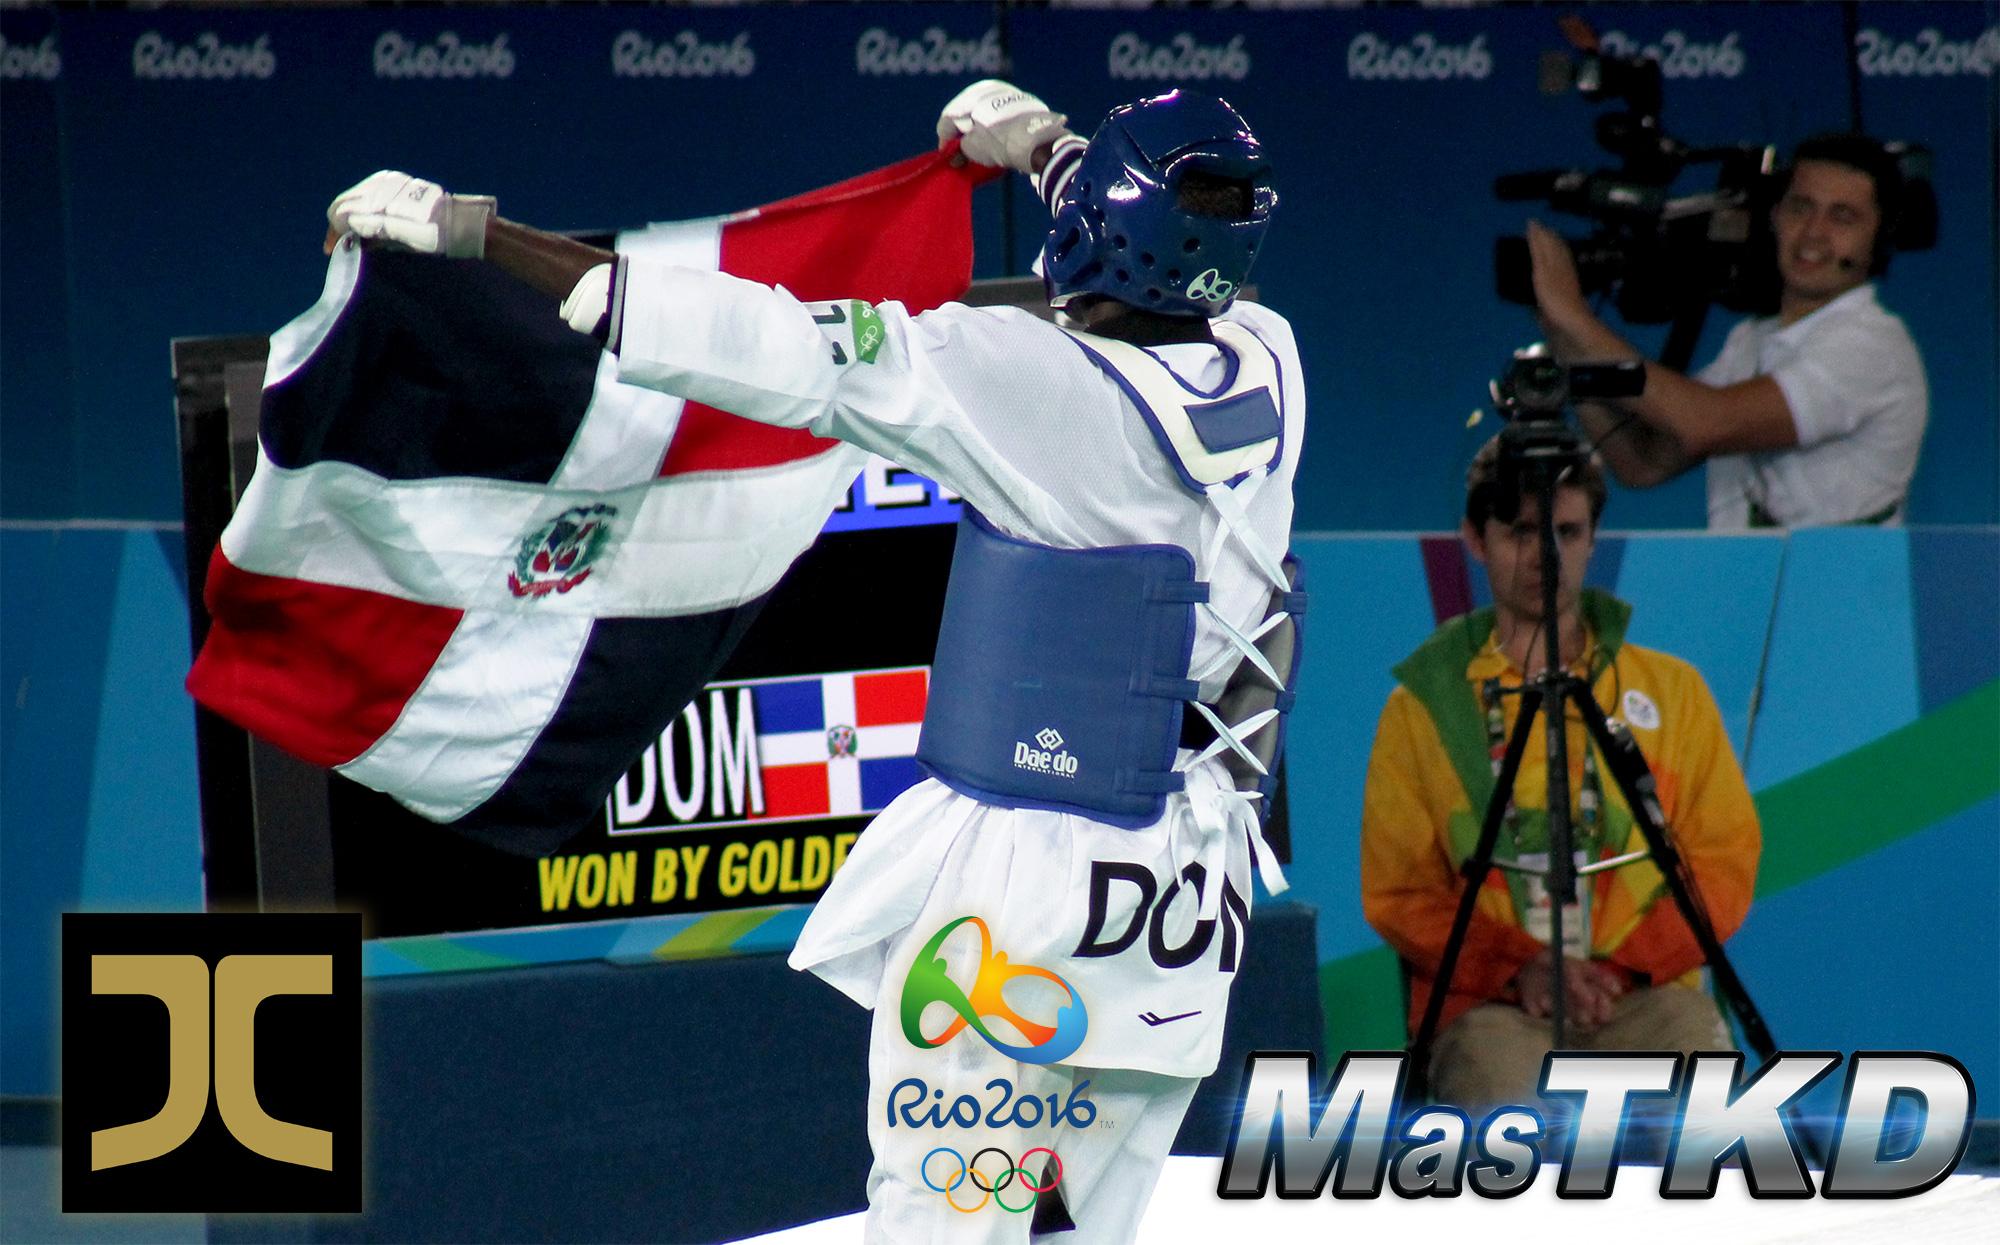 20160817_Taekwondo_JC_masTKD_Rio2016_01